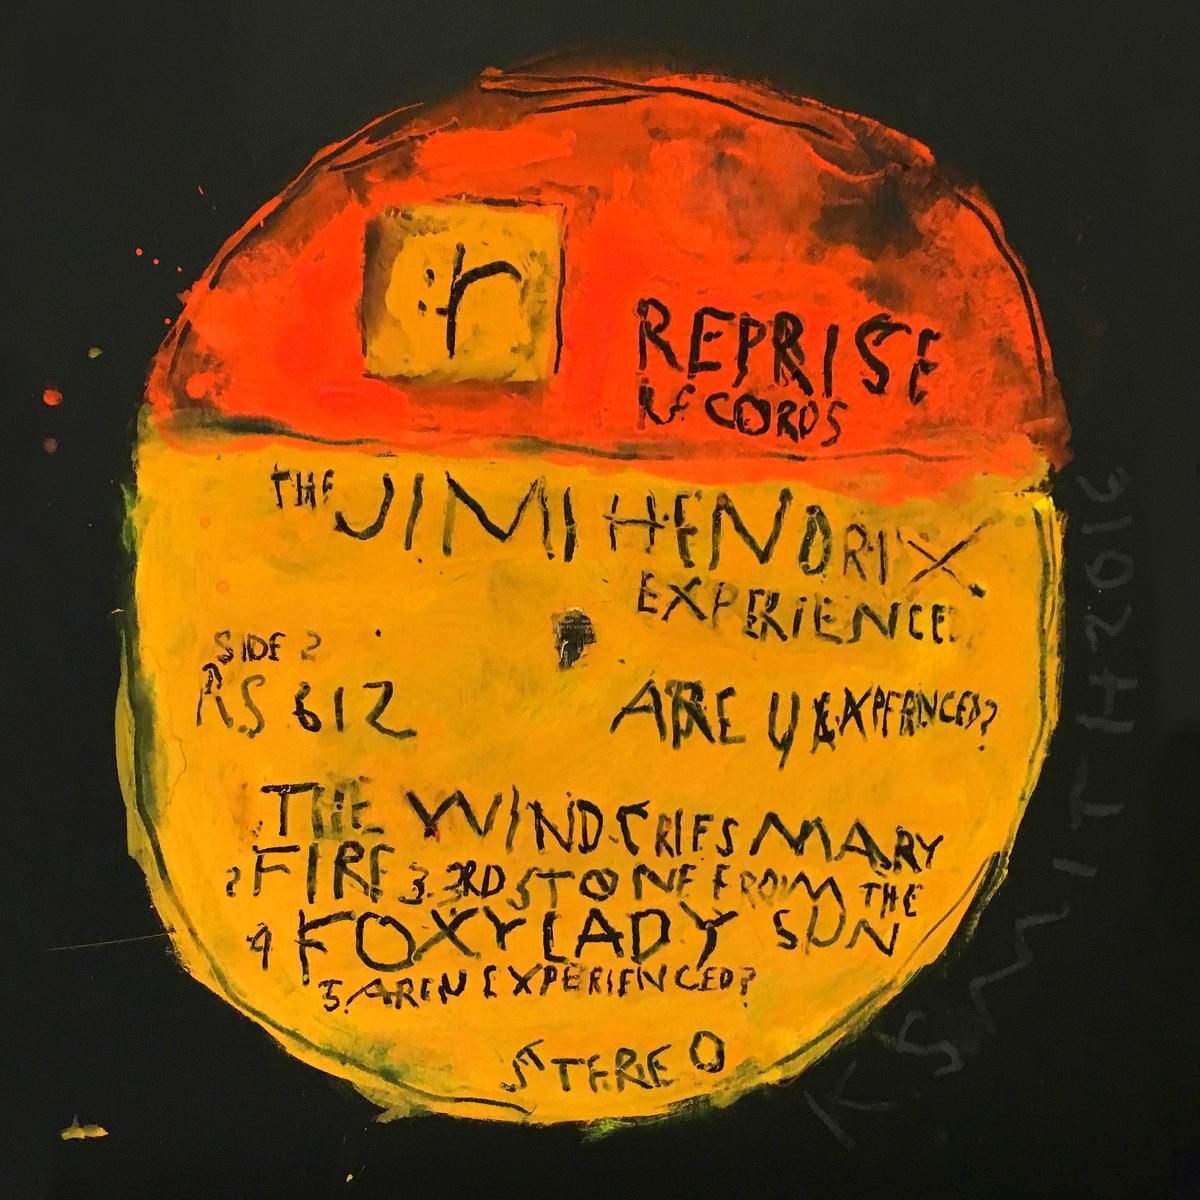 Jimi Hendrix / Are you experienced?